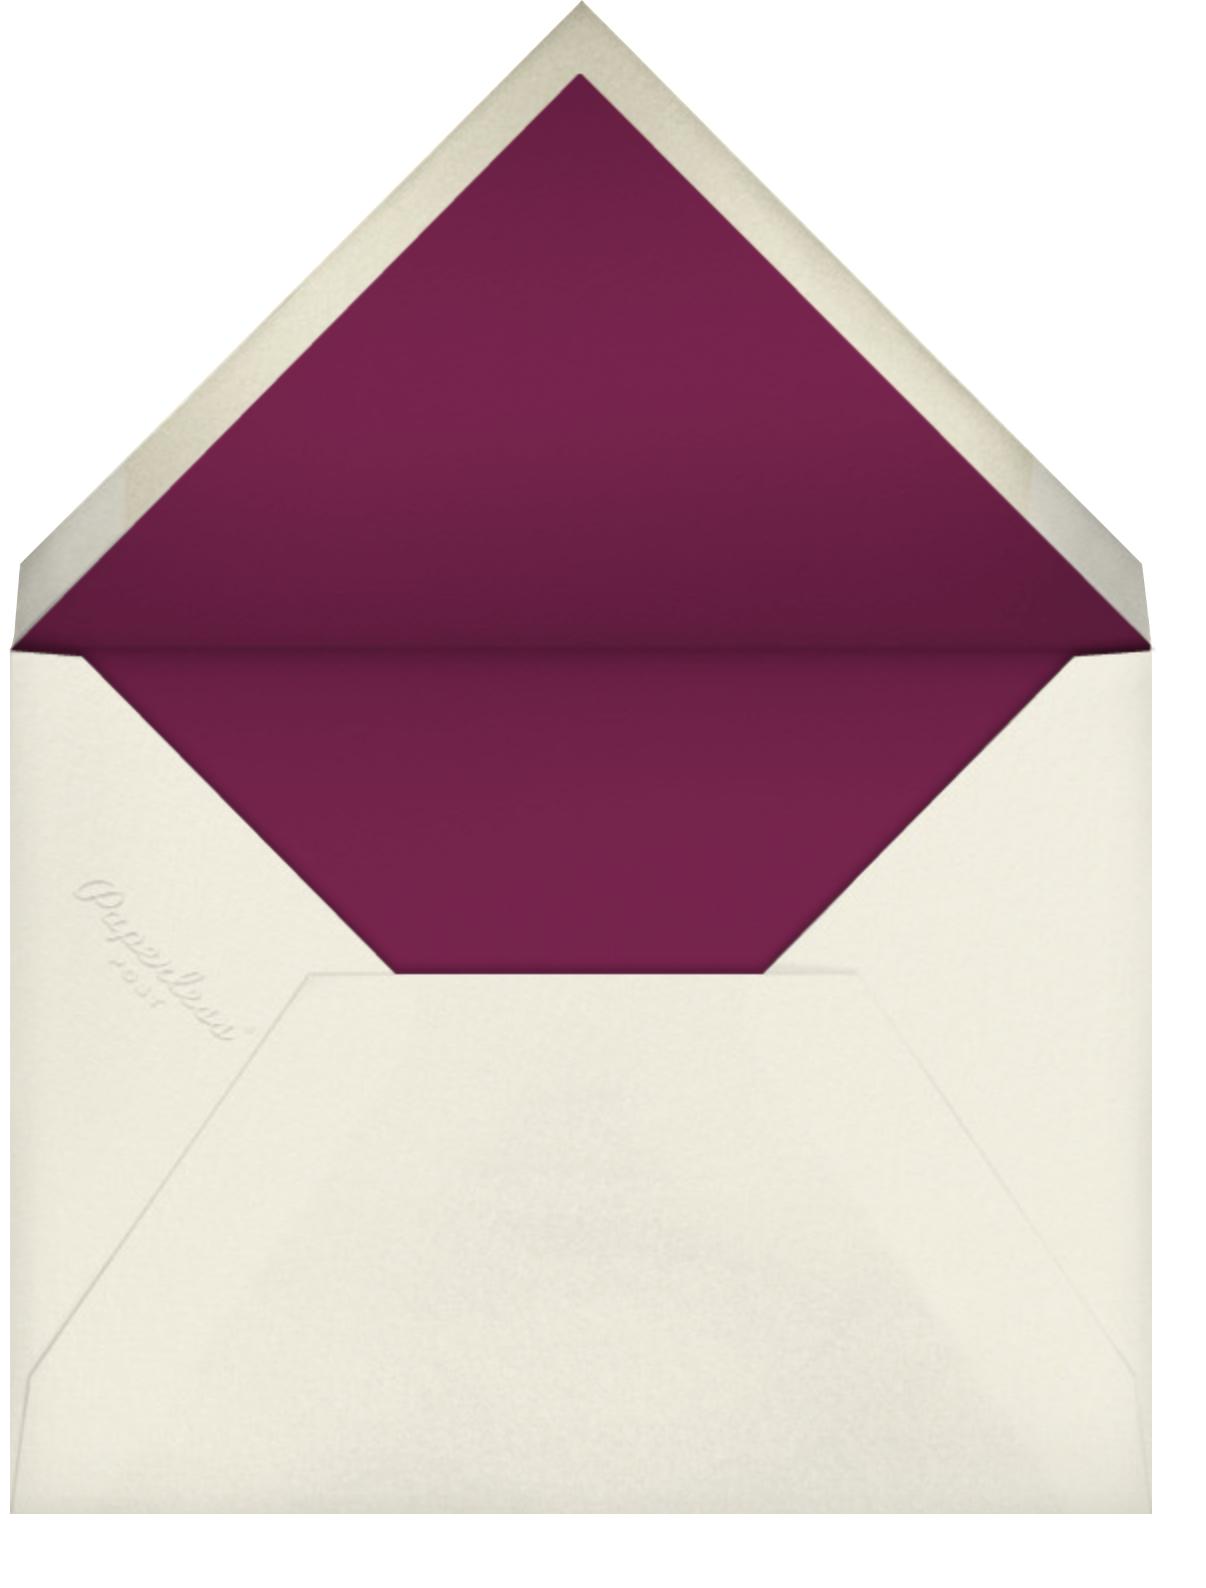 Ballet Birthday (Yelena Bryksenkova) - Tan - Red Cap Cards - Envelope